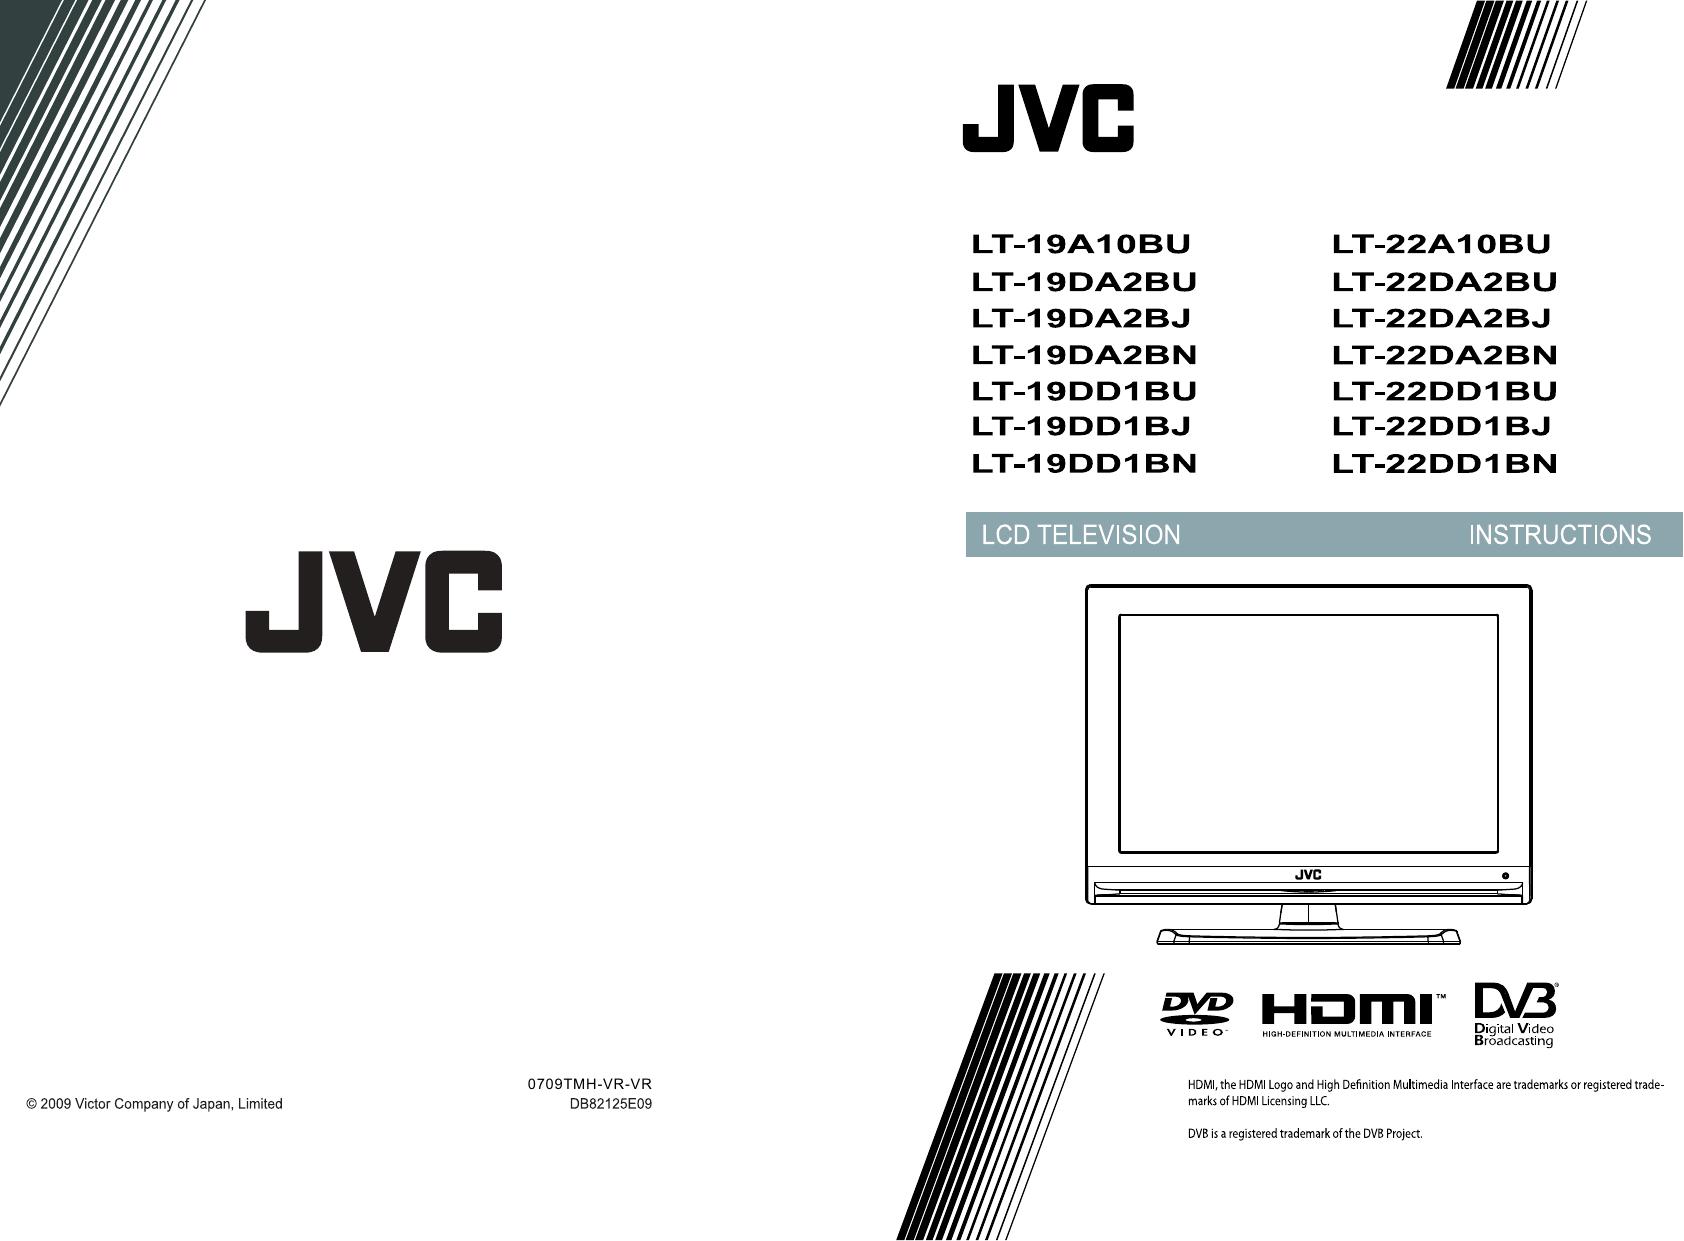 JVC LT 19DA2BJ 19A10BU, 22A10BU, 19DA2BU, 22DA2BU, 19DA2BJ